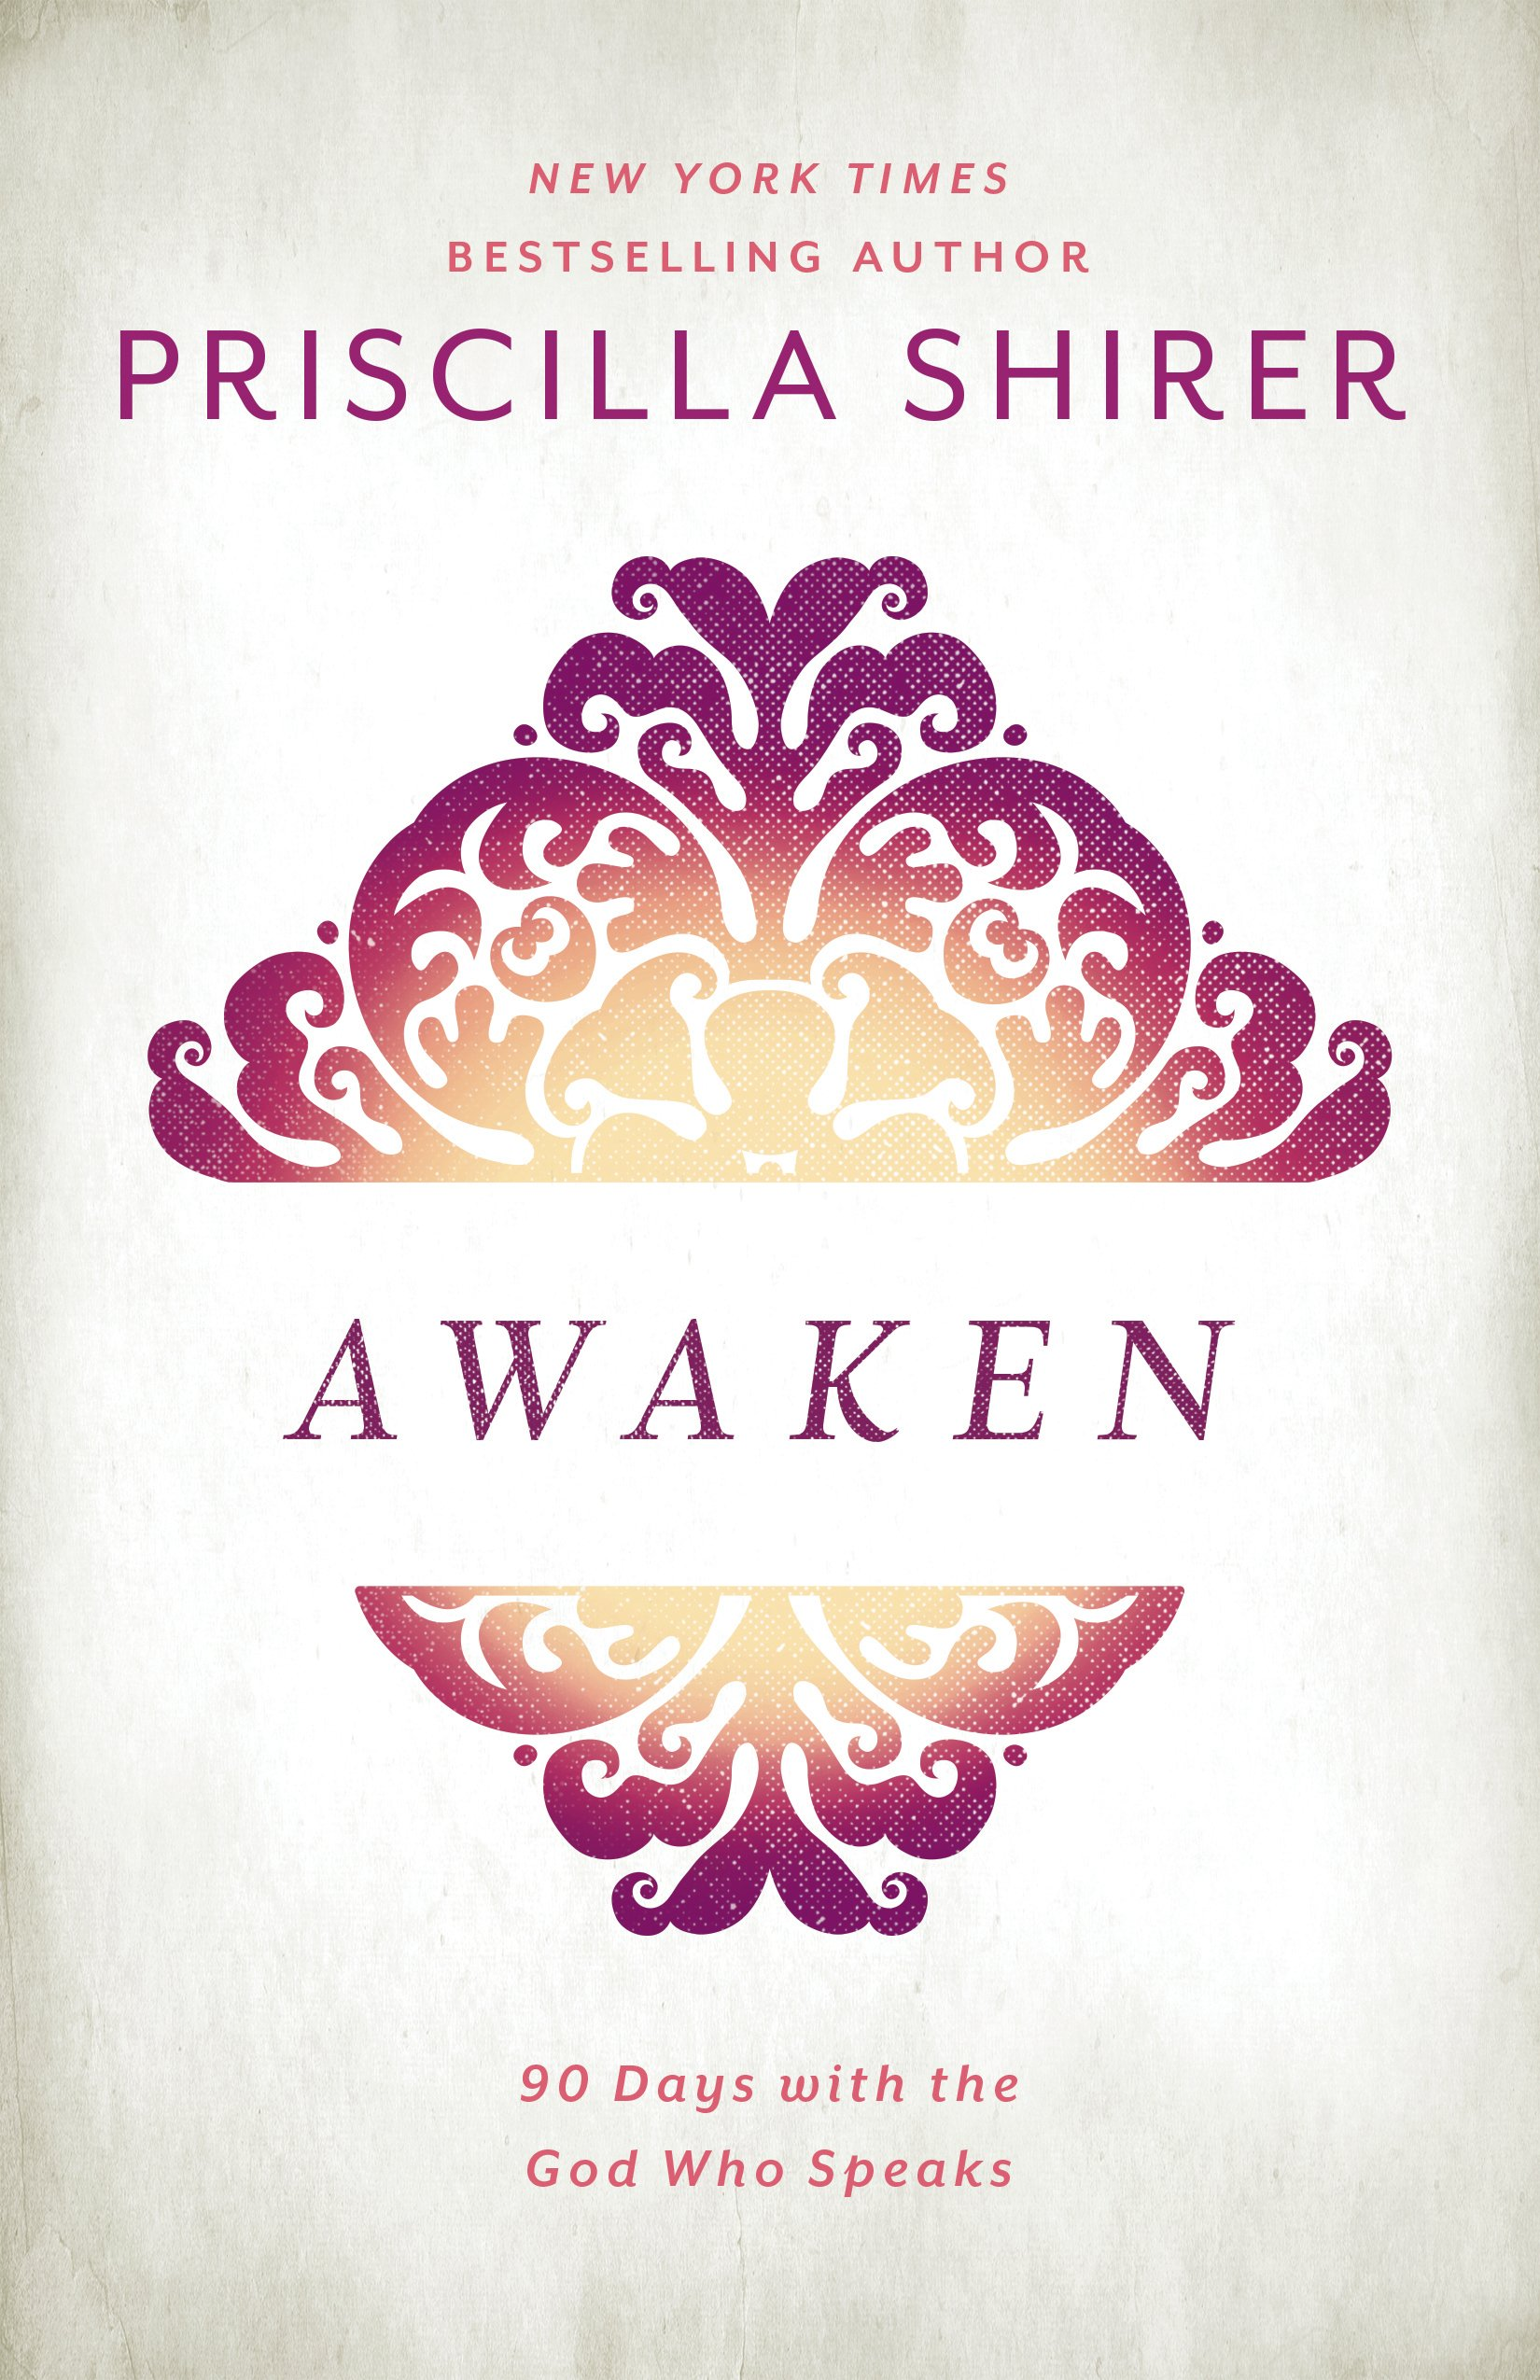 12. - AWAKENby Priscilla Shirer